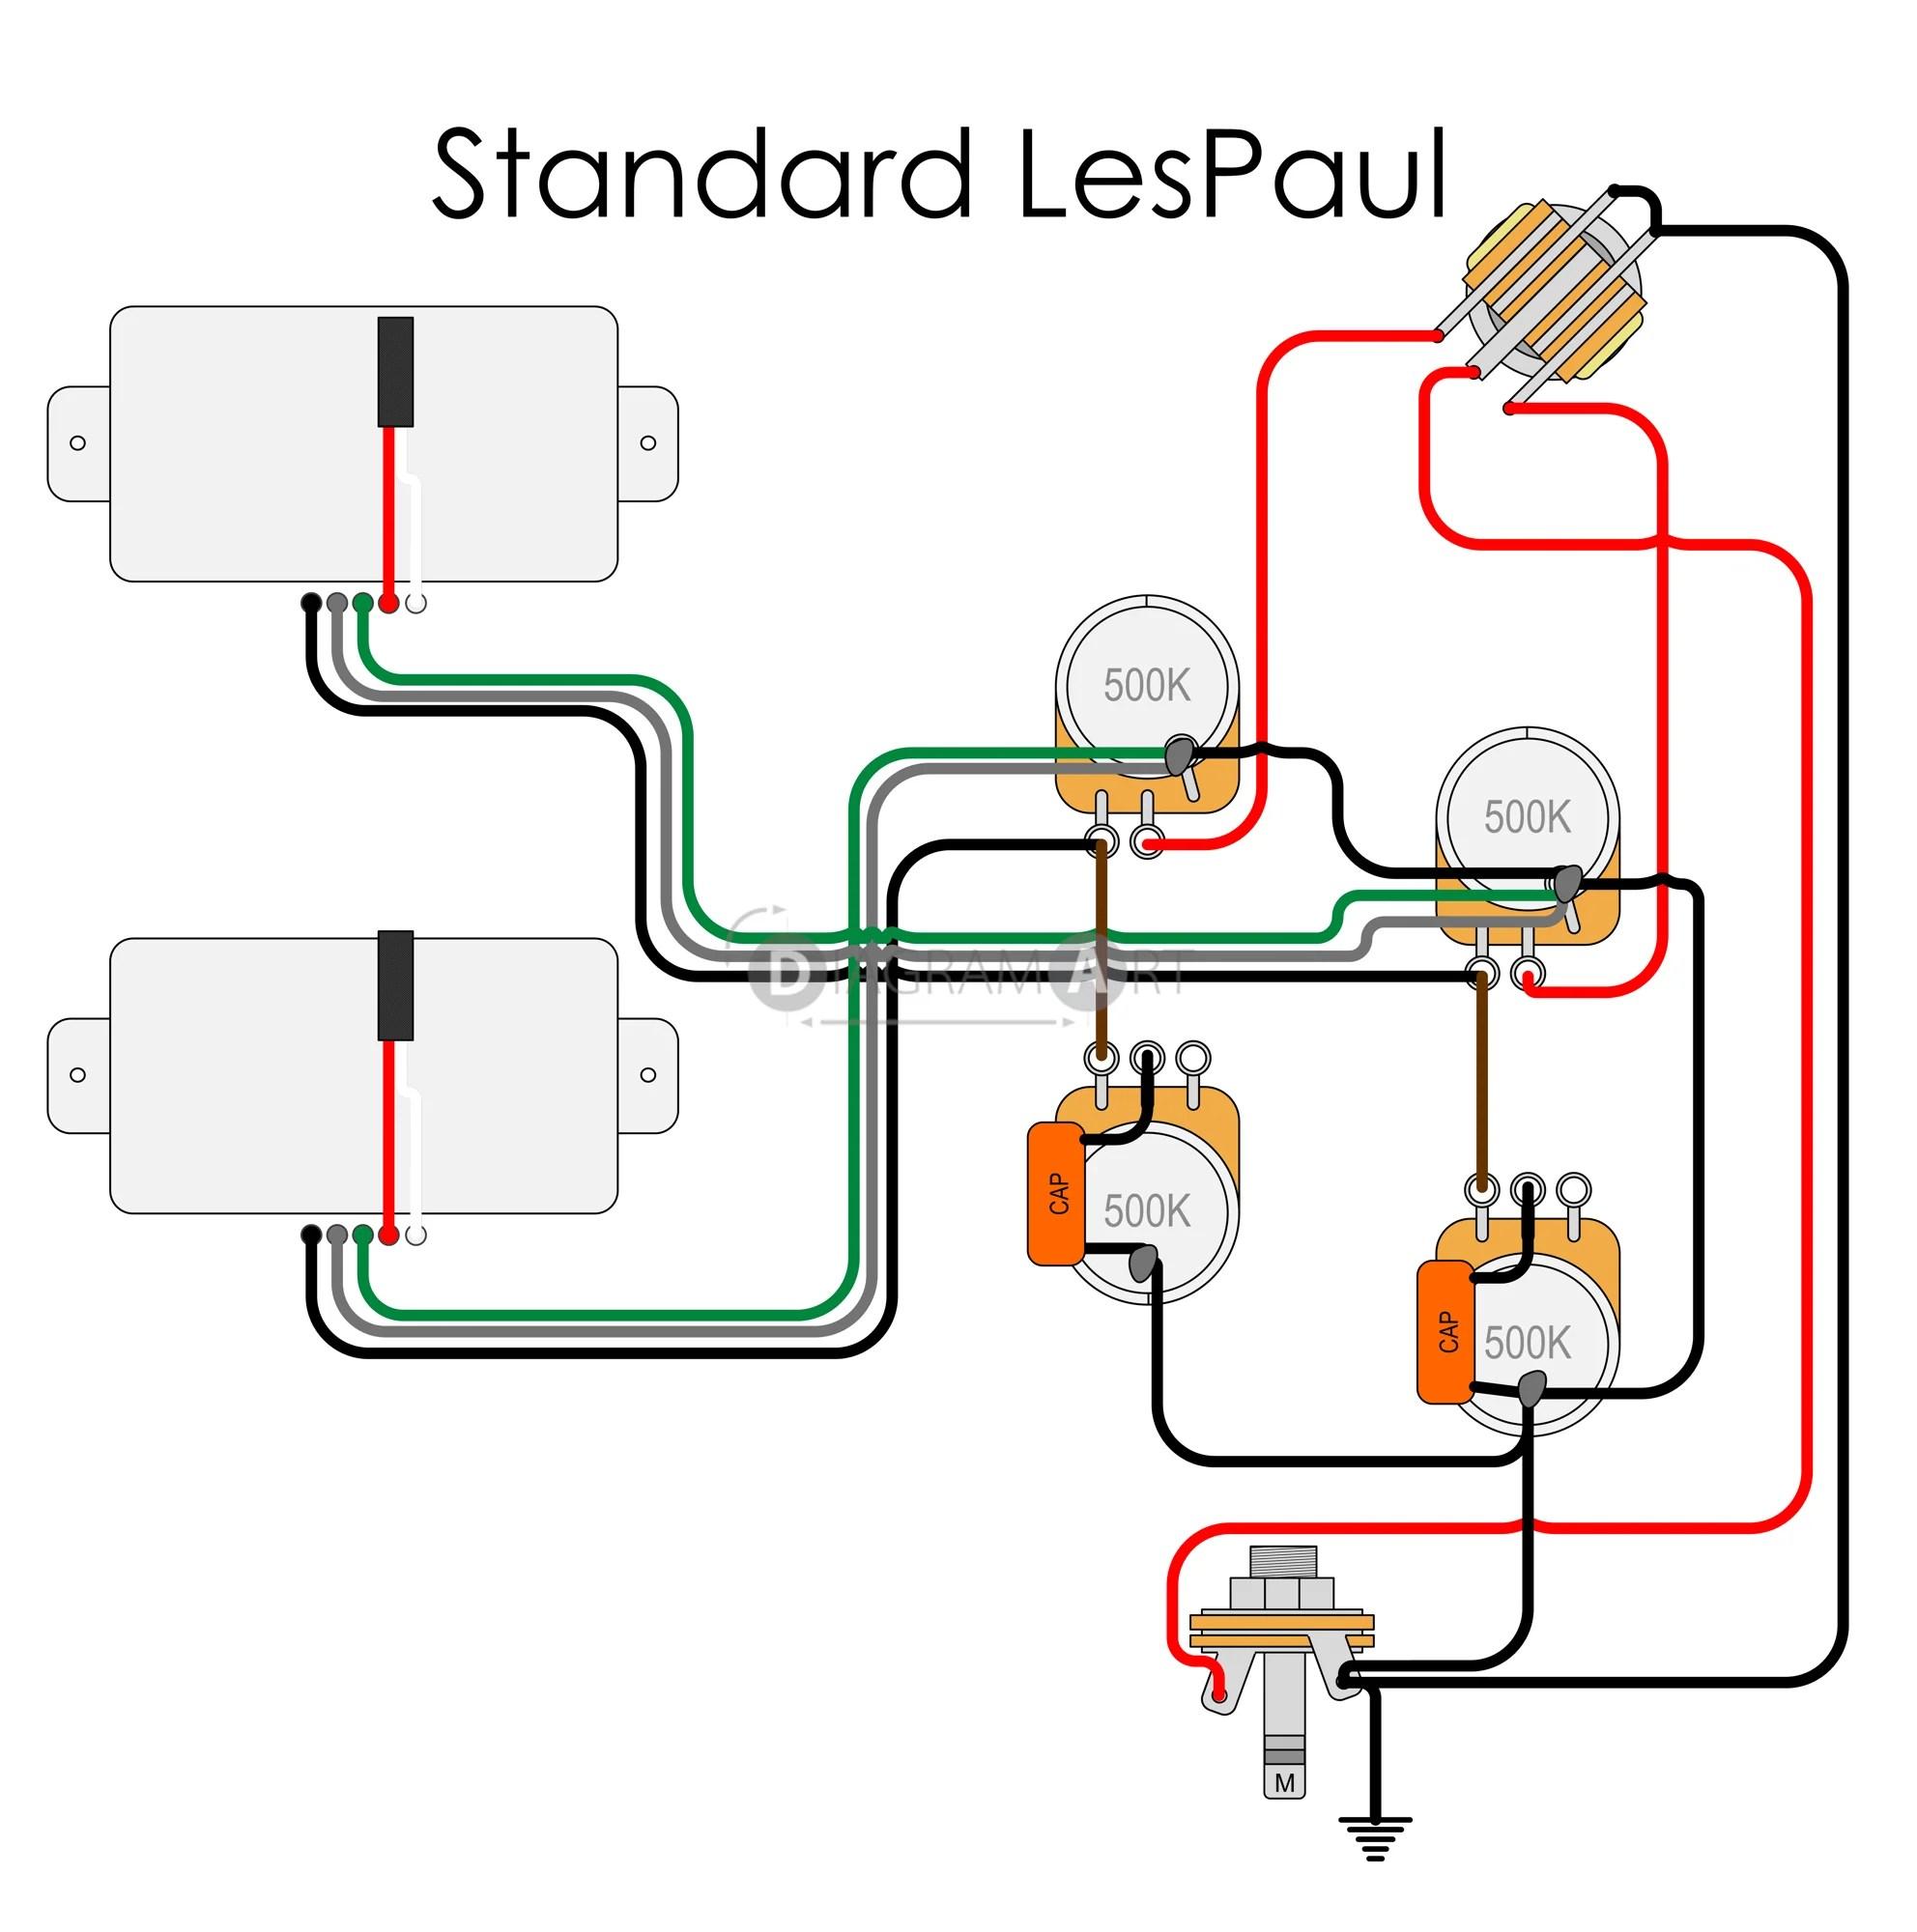 electric guitar wiring standard lespaul electric circuit diagramart les paul axcess wiring diagram standard les paul wiring diagram [ 1984 x 2000 Pixel ]